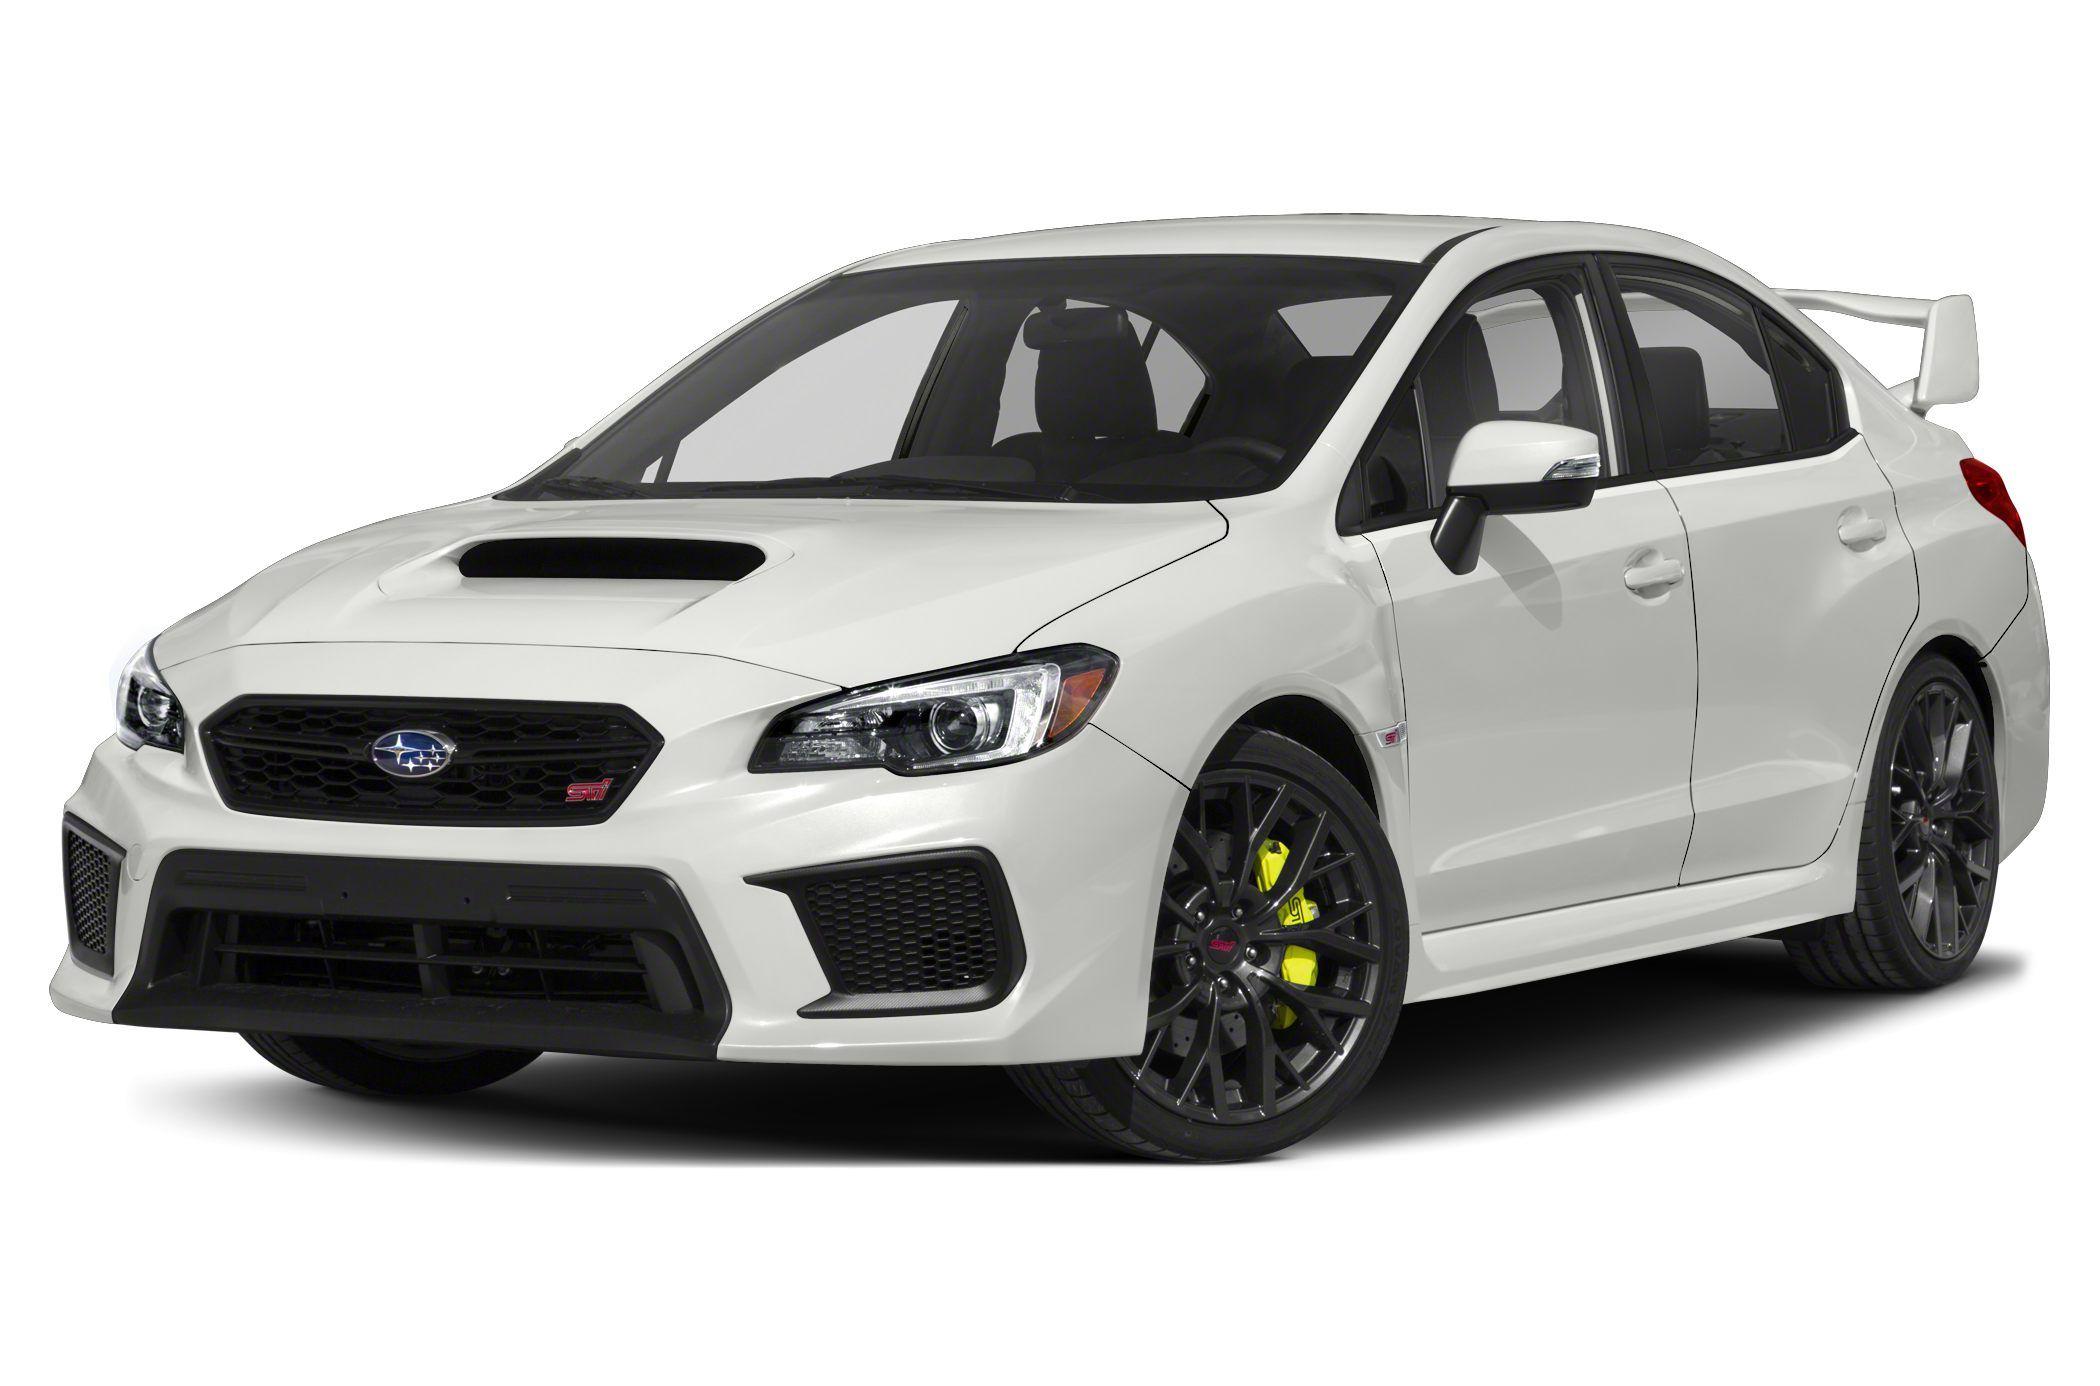 Subaru Sti 2020 Price Price Di 2020 Mobil